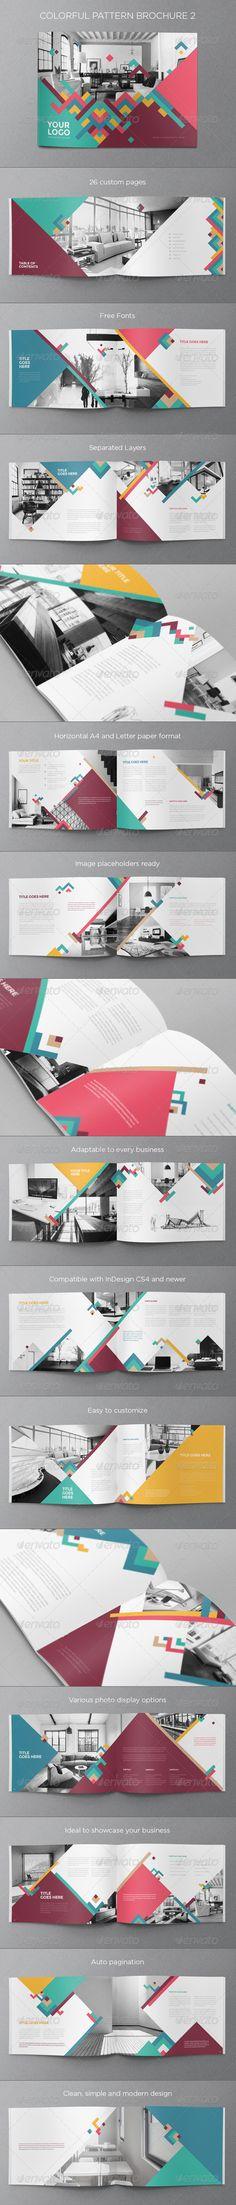 Colorful Pattern Brochure 2 - Brochures Print Templates